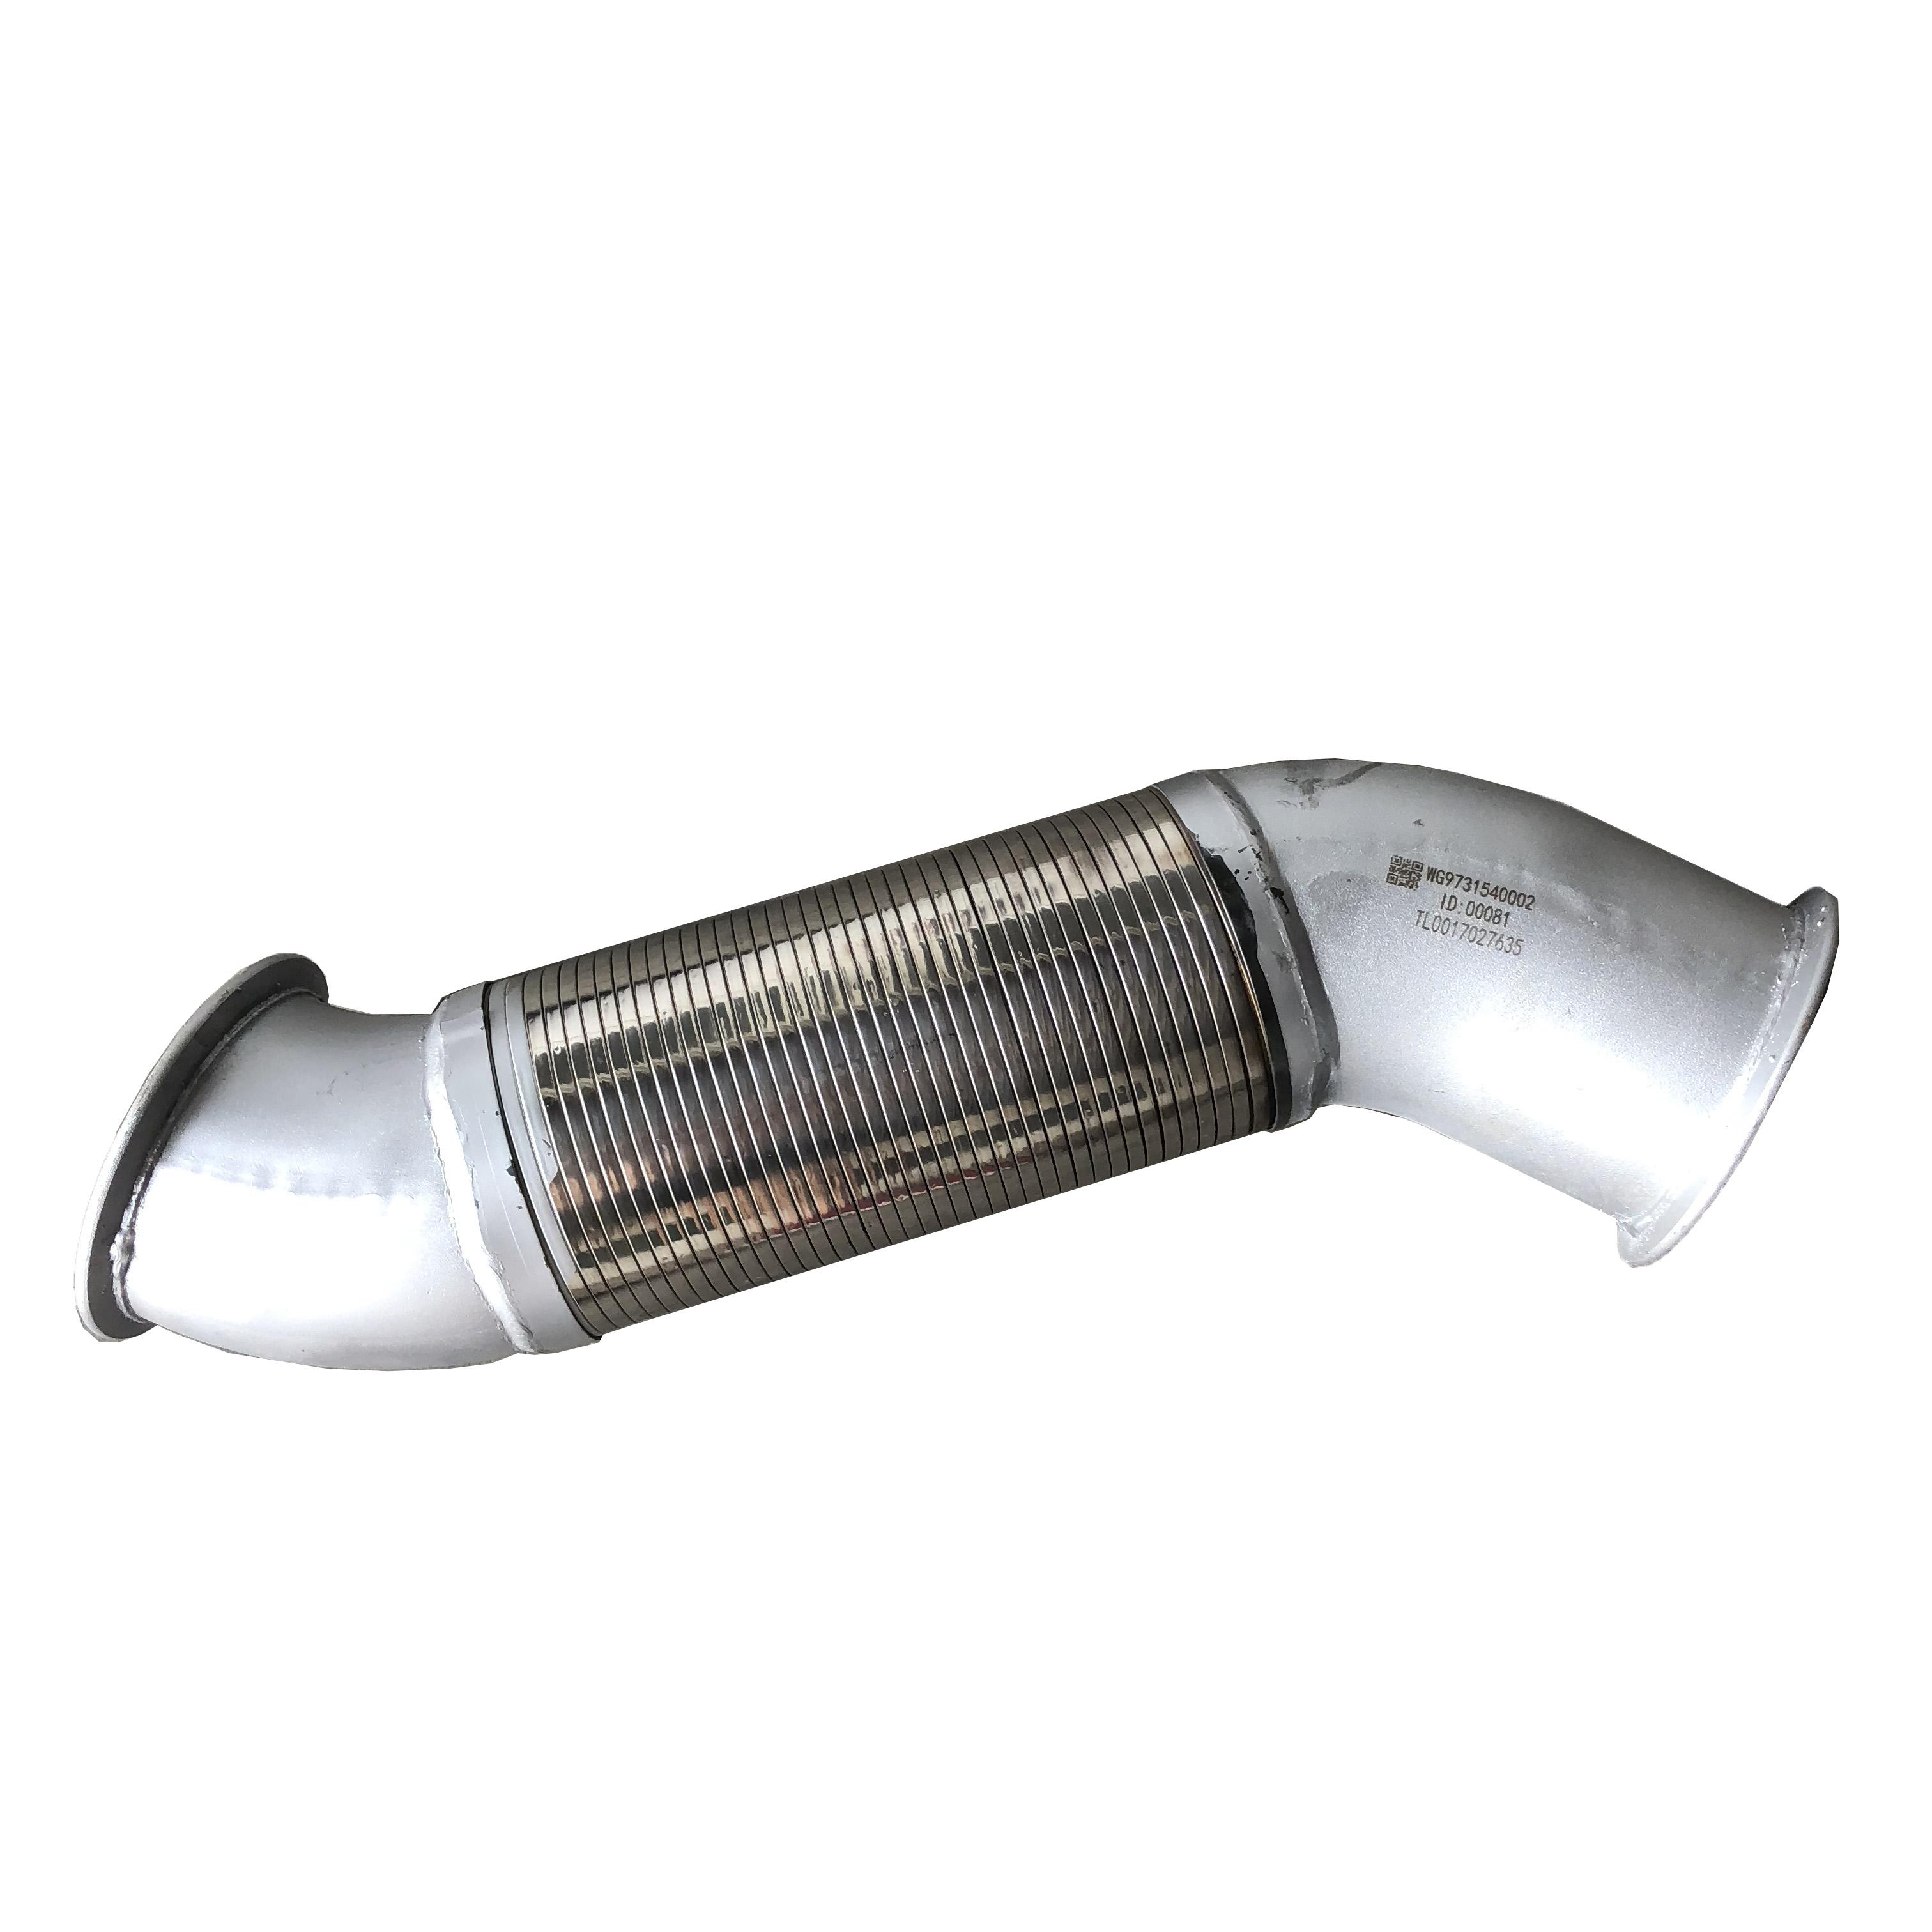 sinotruk howo truck exhaust flexible pipe repair kits wg9731540002 buy exhaust flexible pipe repair kits wg9731540002 exhaust flexible pipe product